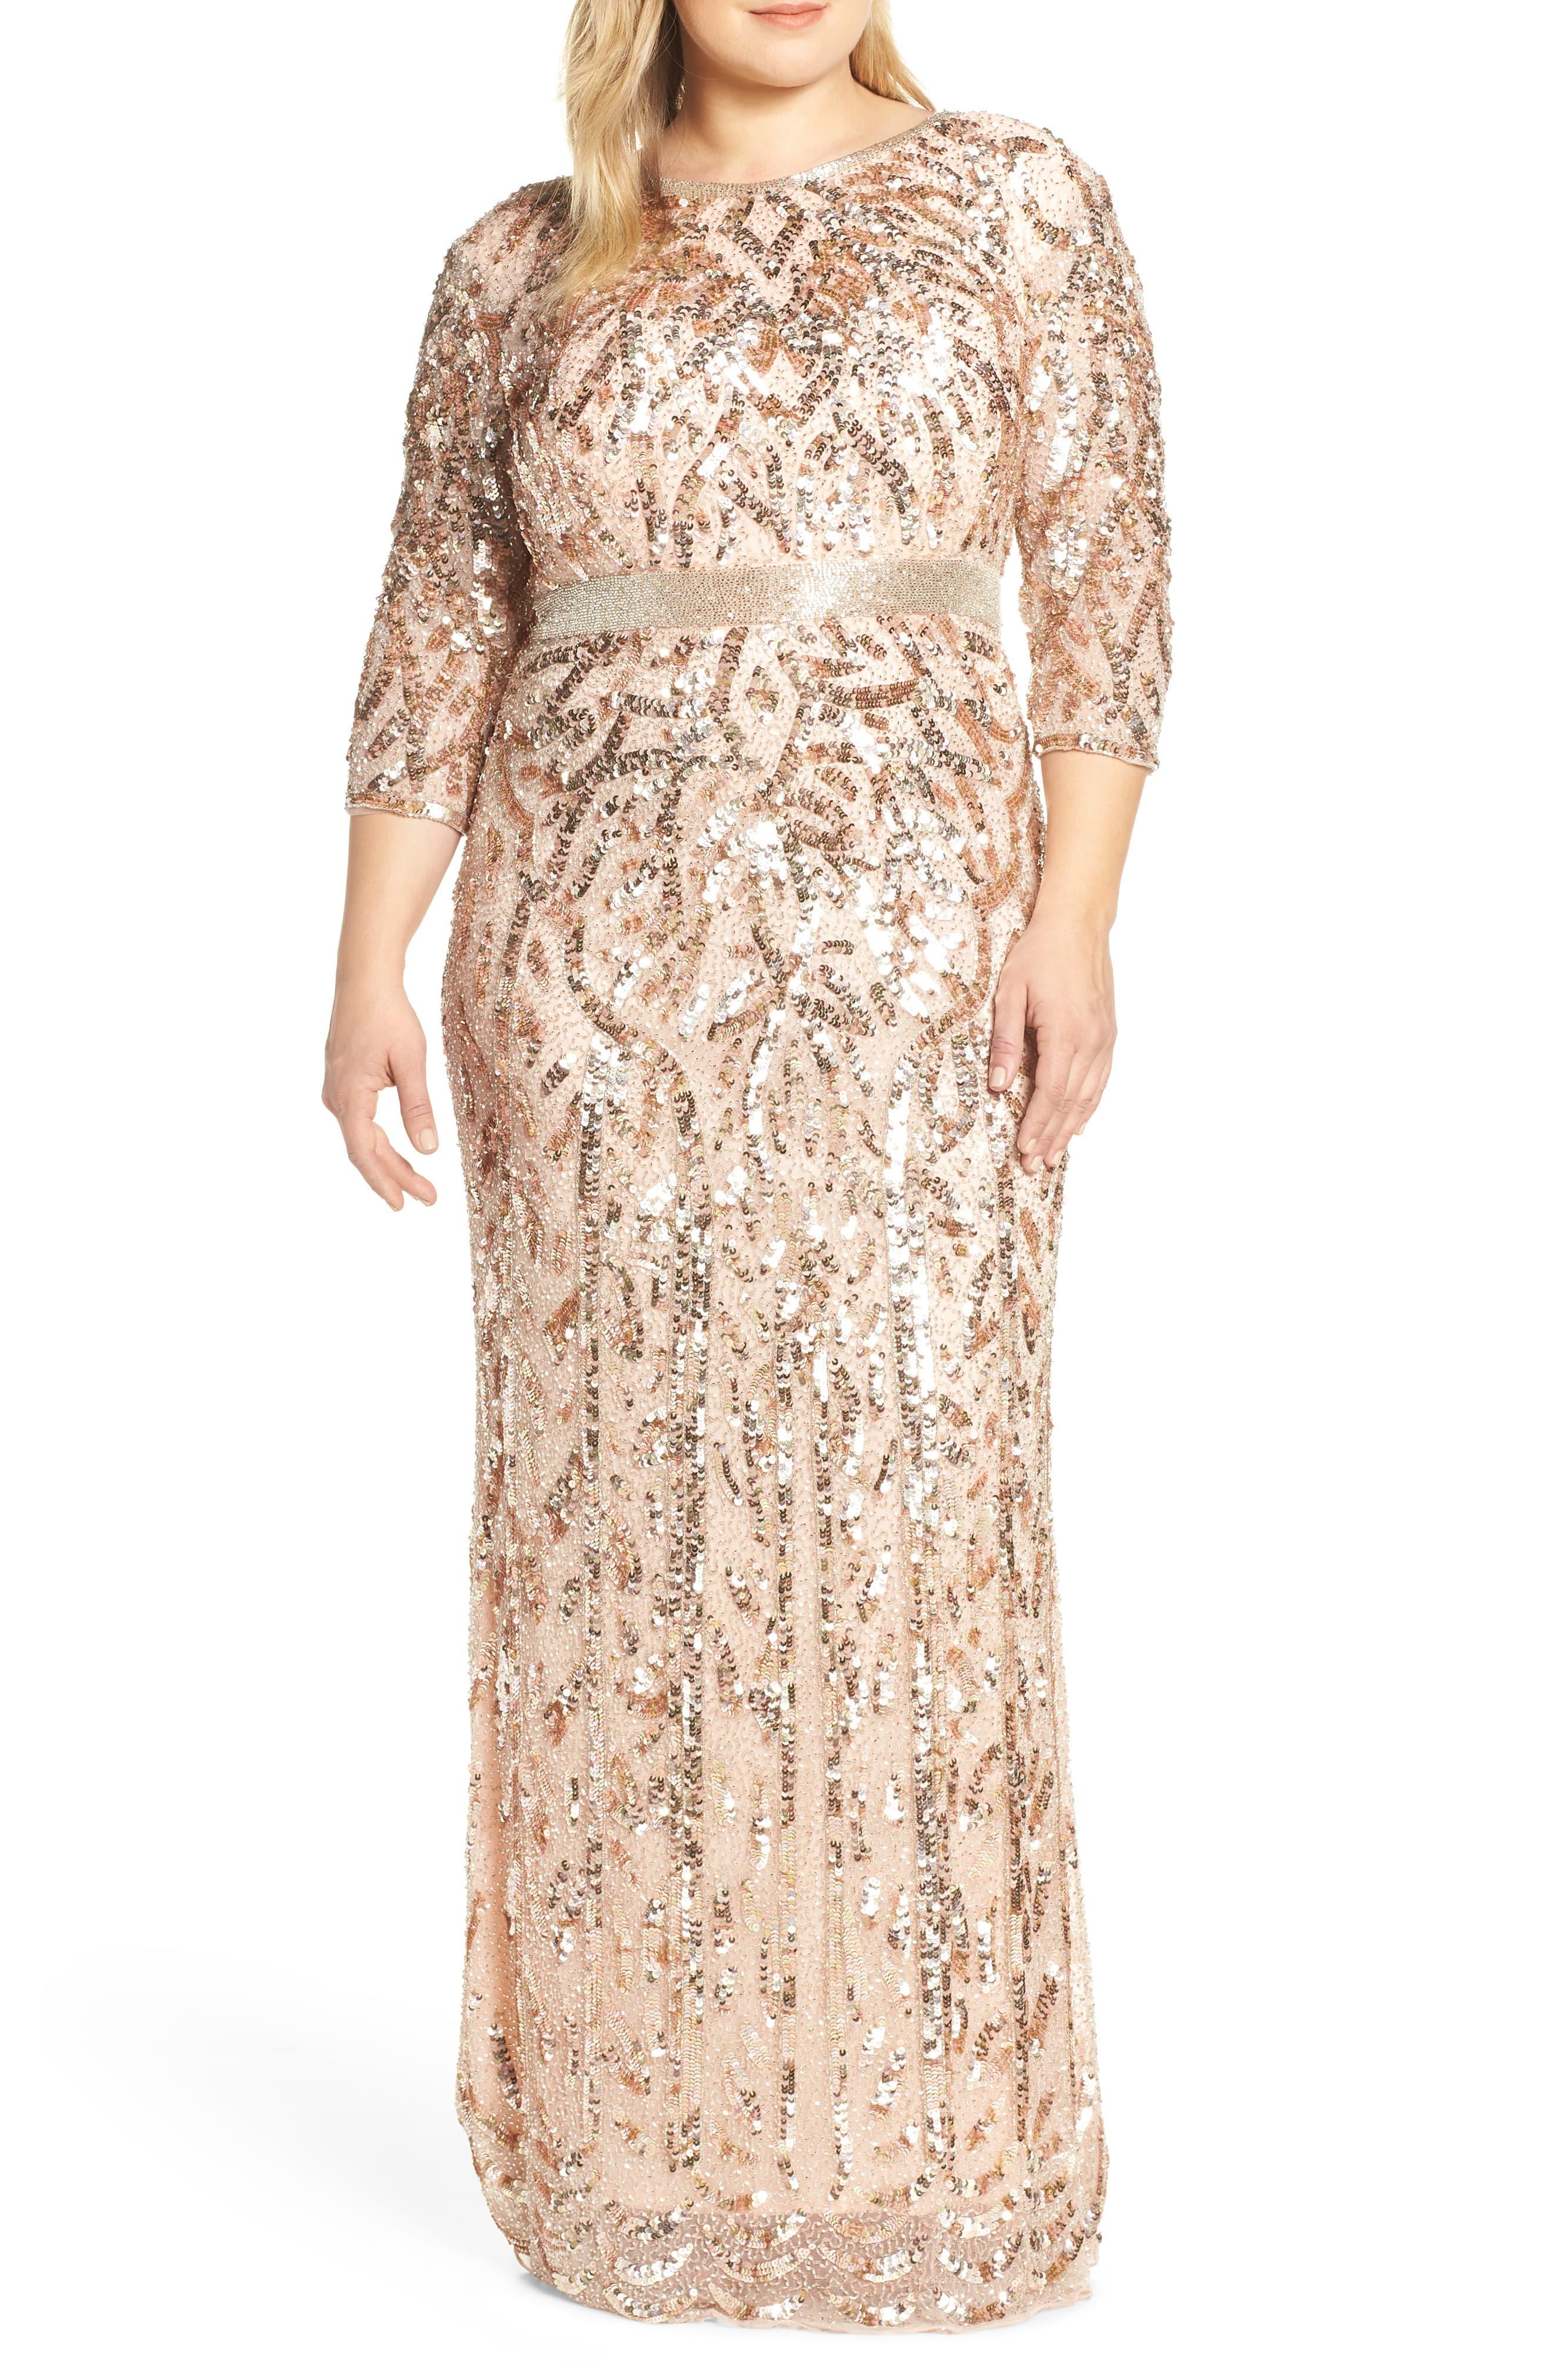 Mac Duggal Beaded Evening Dress Plus Size Nordstrom In 2021 Evening Dresses Plus Size Evening Dresses Evening Dress Patterns [ 4048 x 2640 Pixel ]